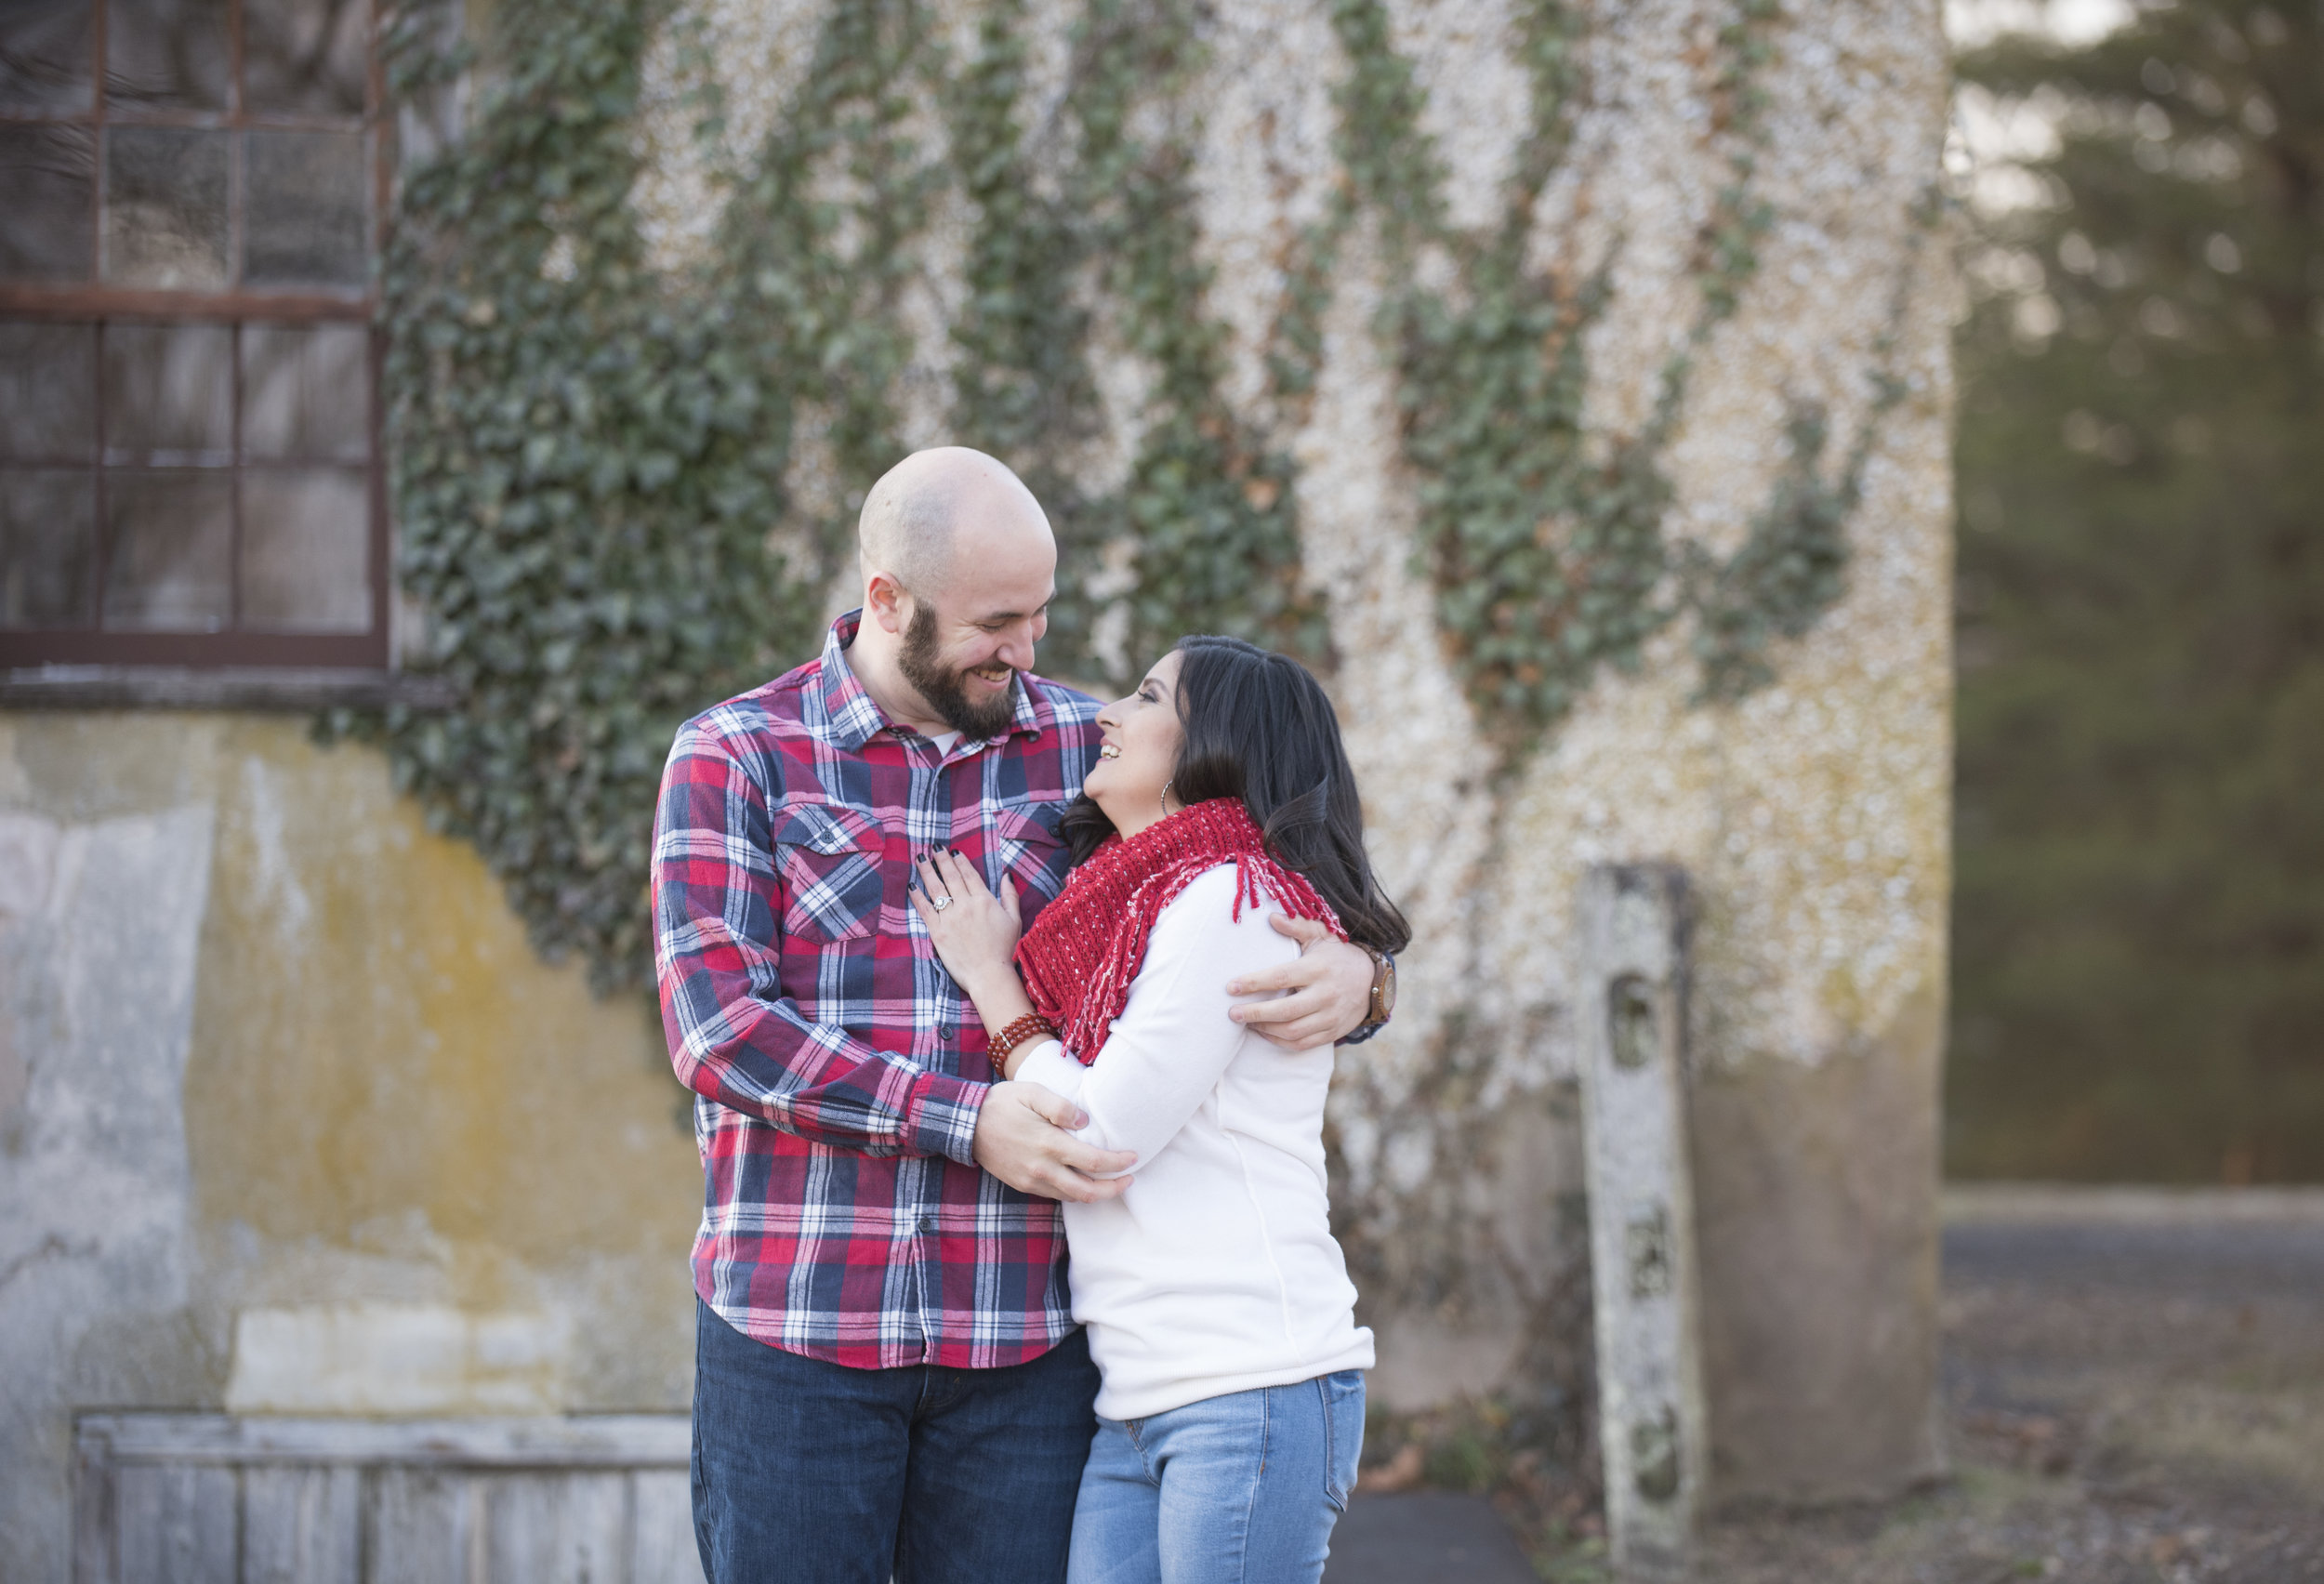 nj-engagement-photographer.jpg